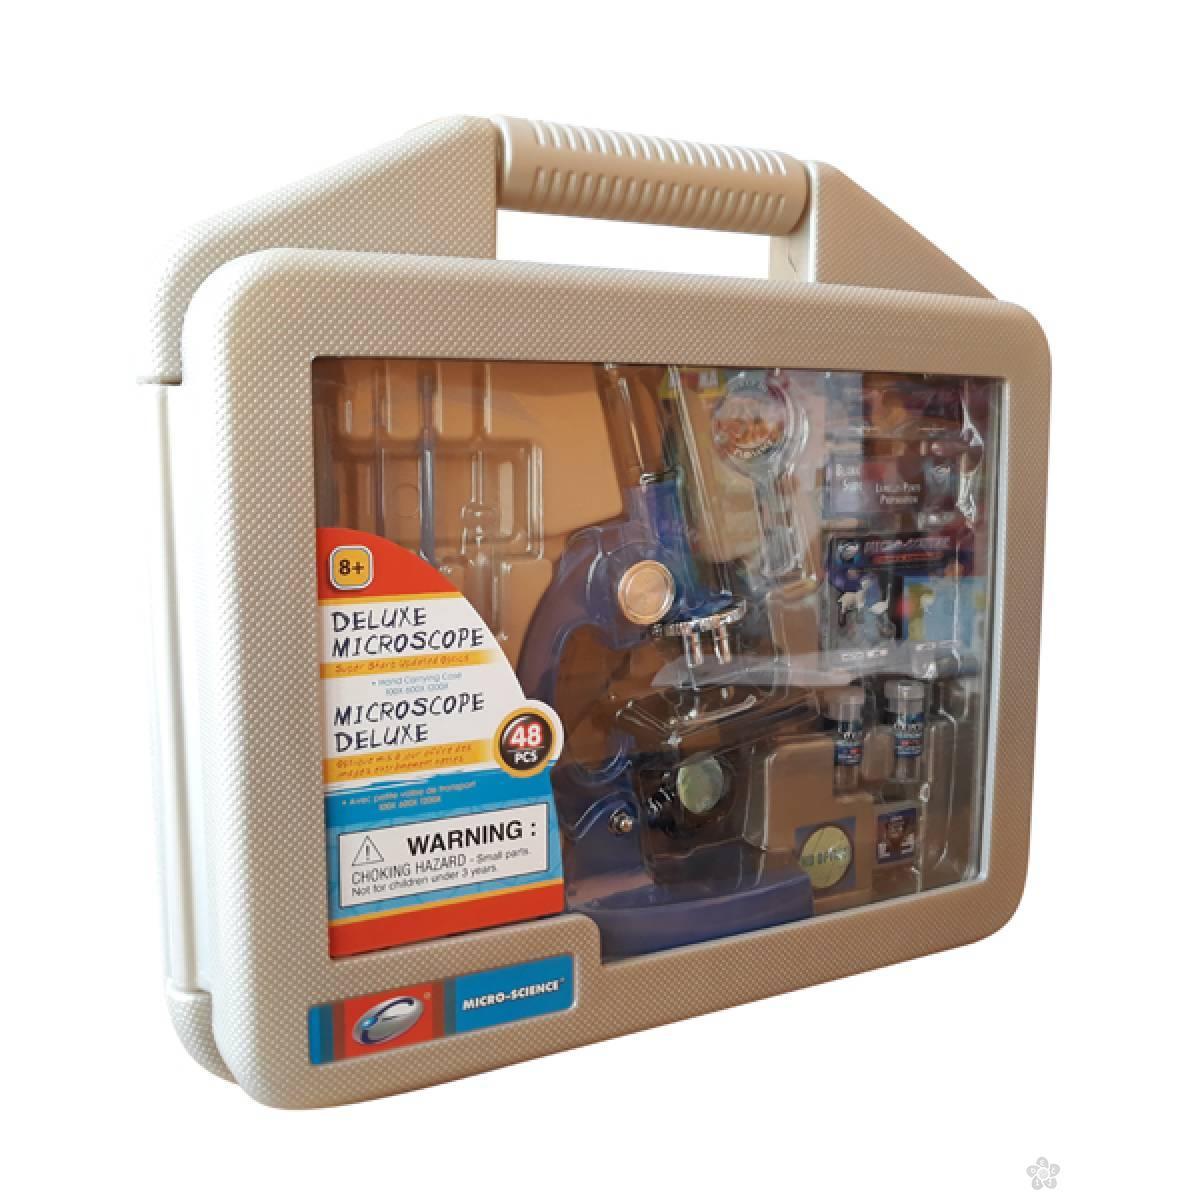 Deluxe mikroskop u koferu 48 delova 90101